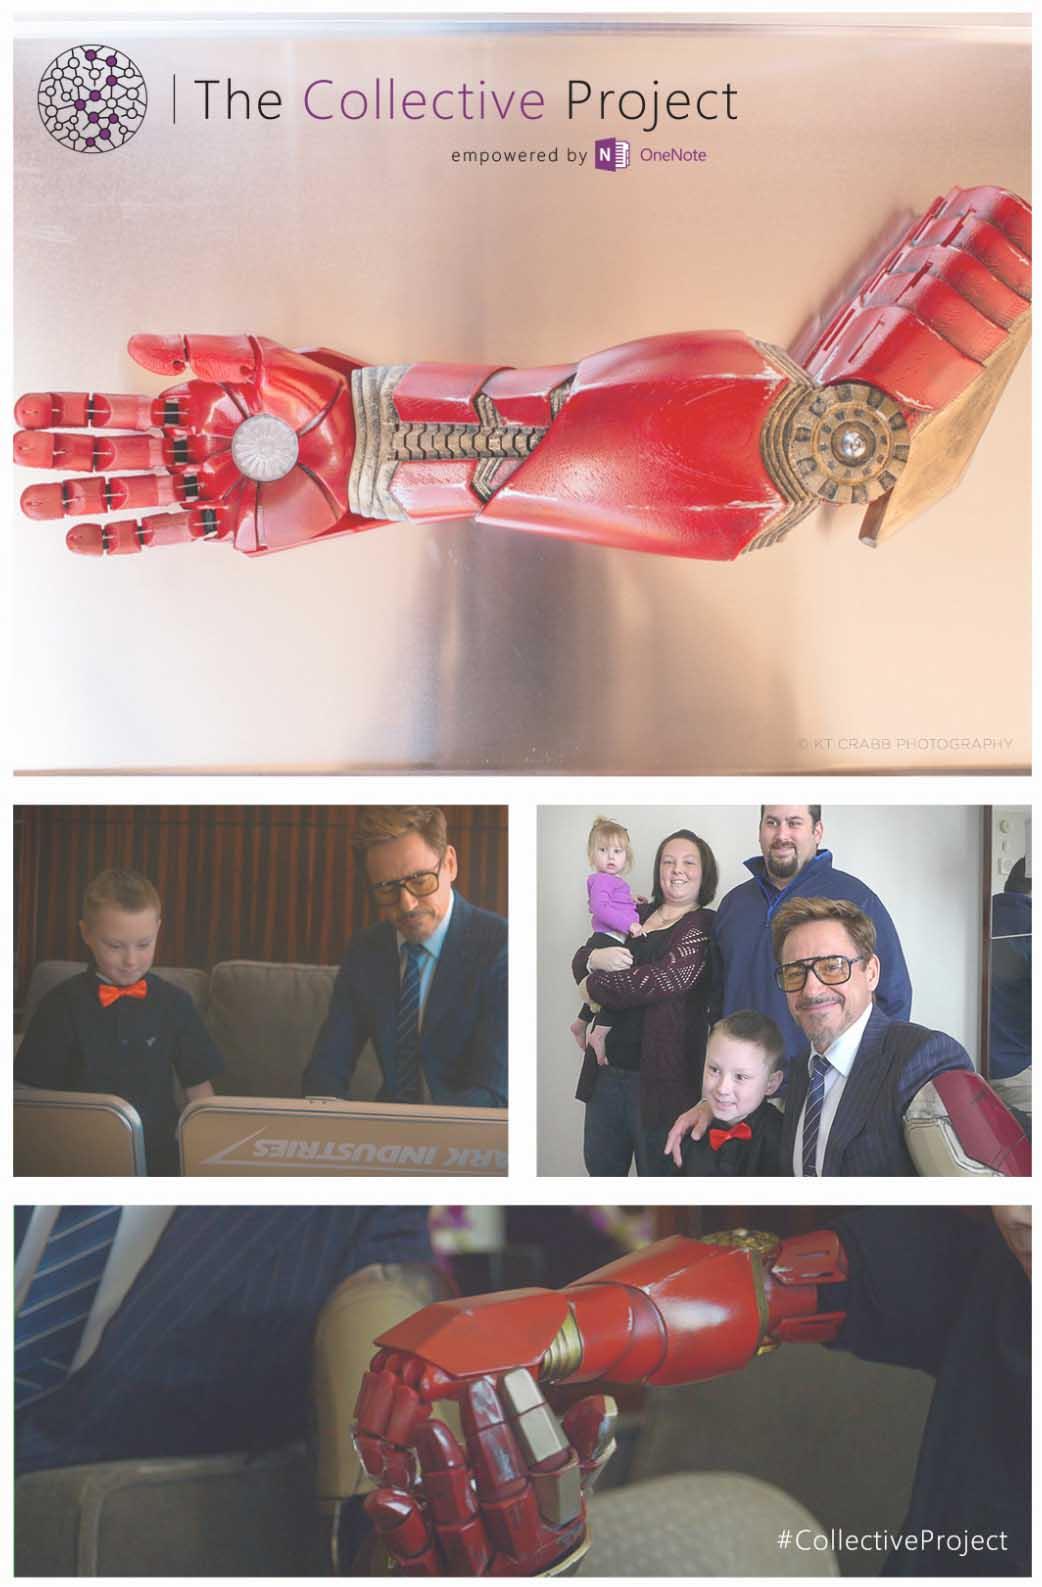 iron-man-arm-bionic